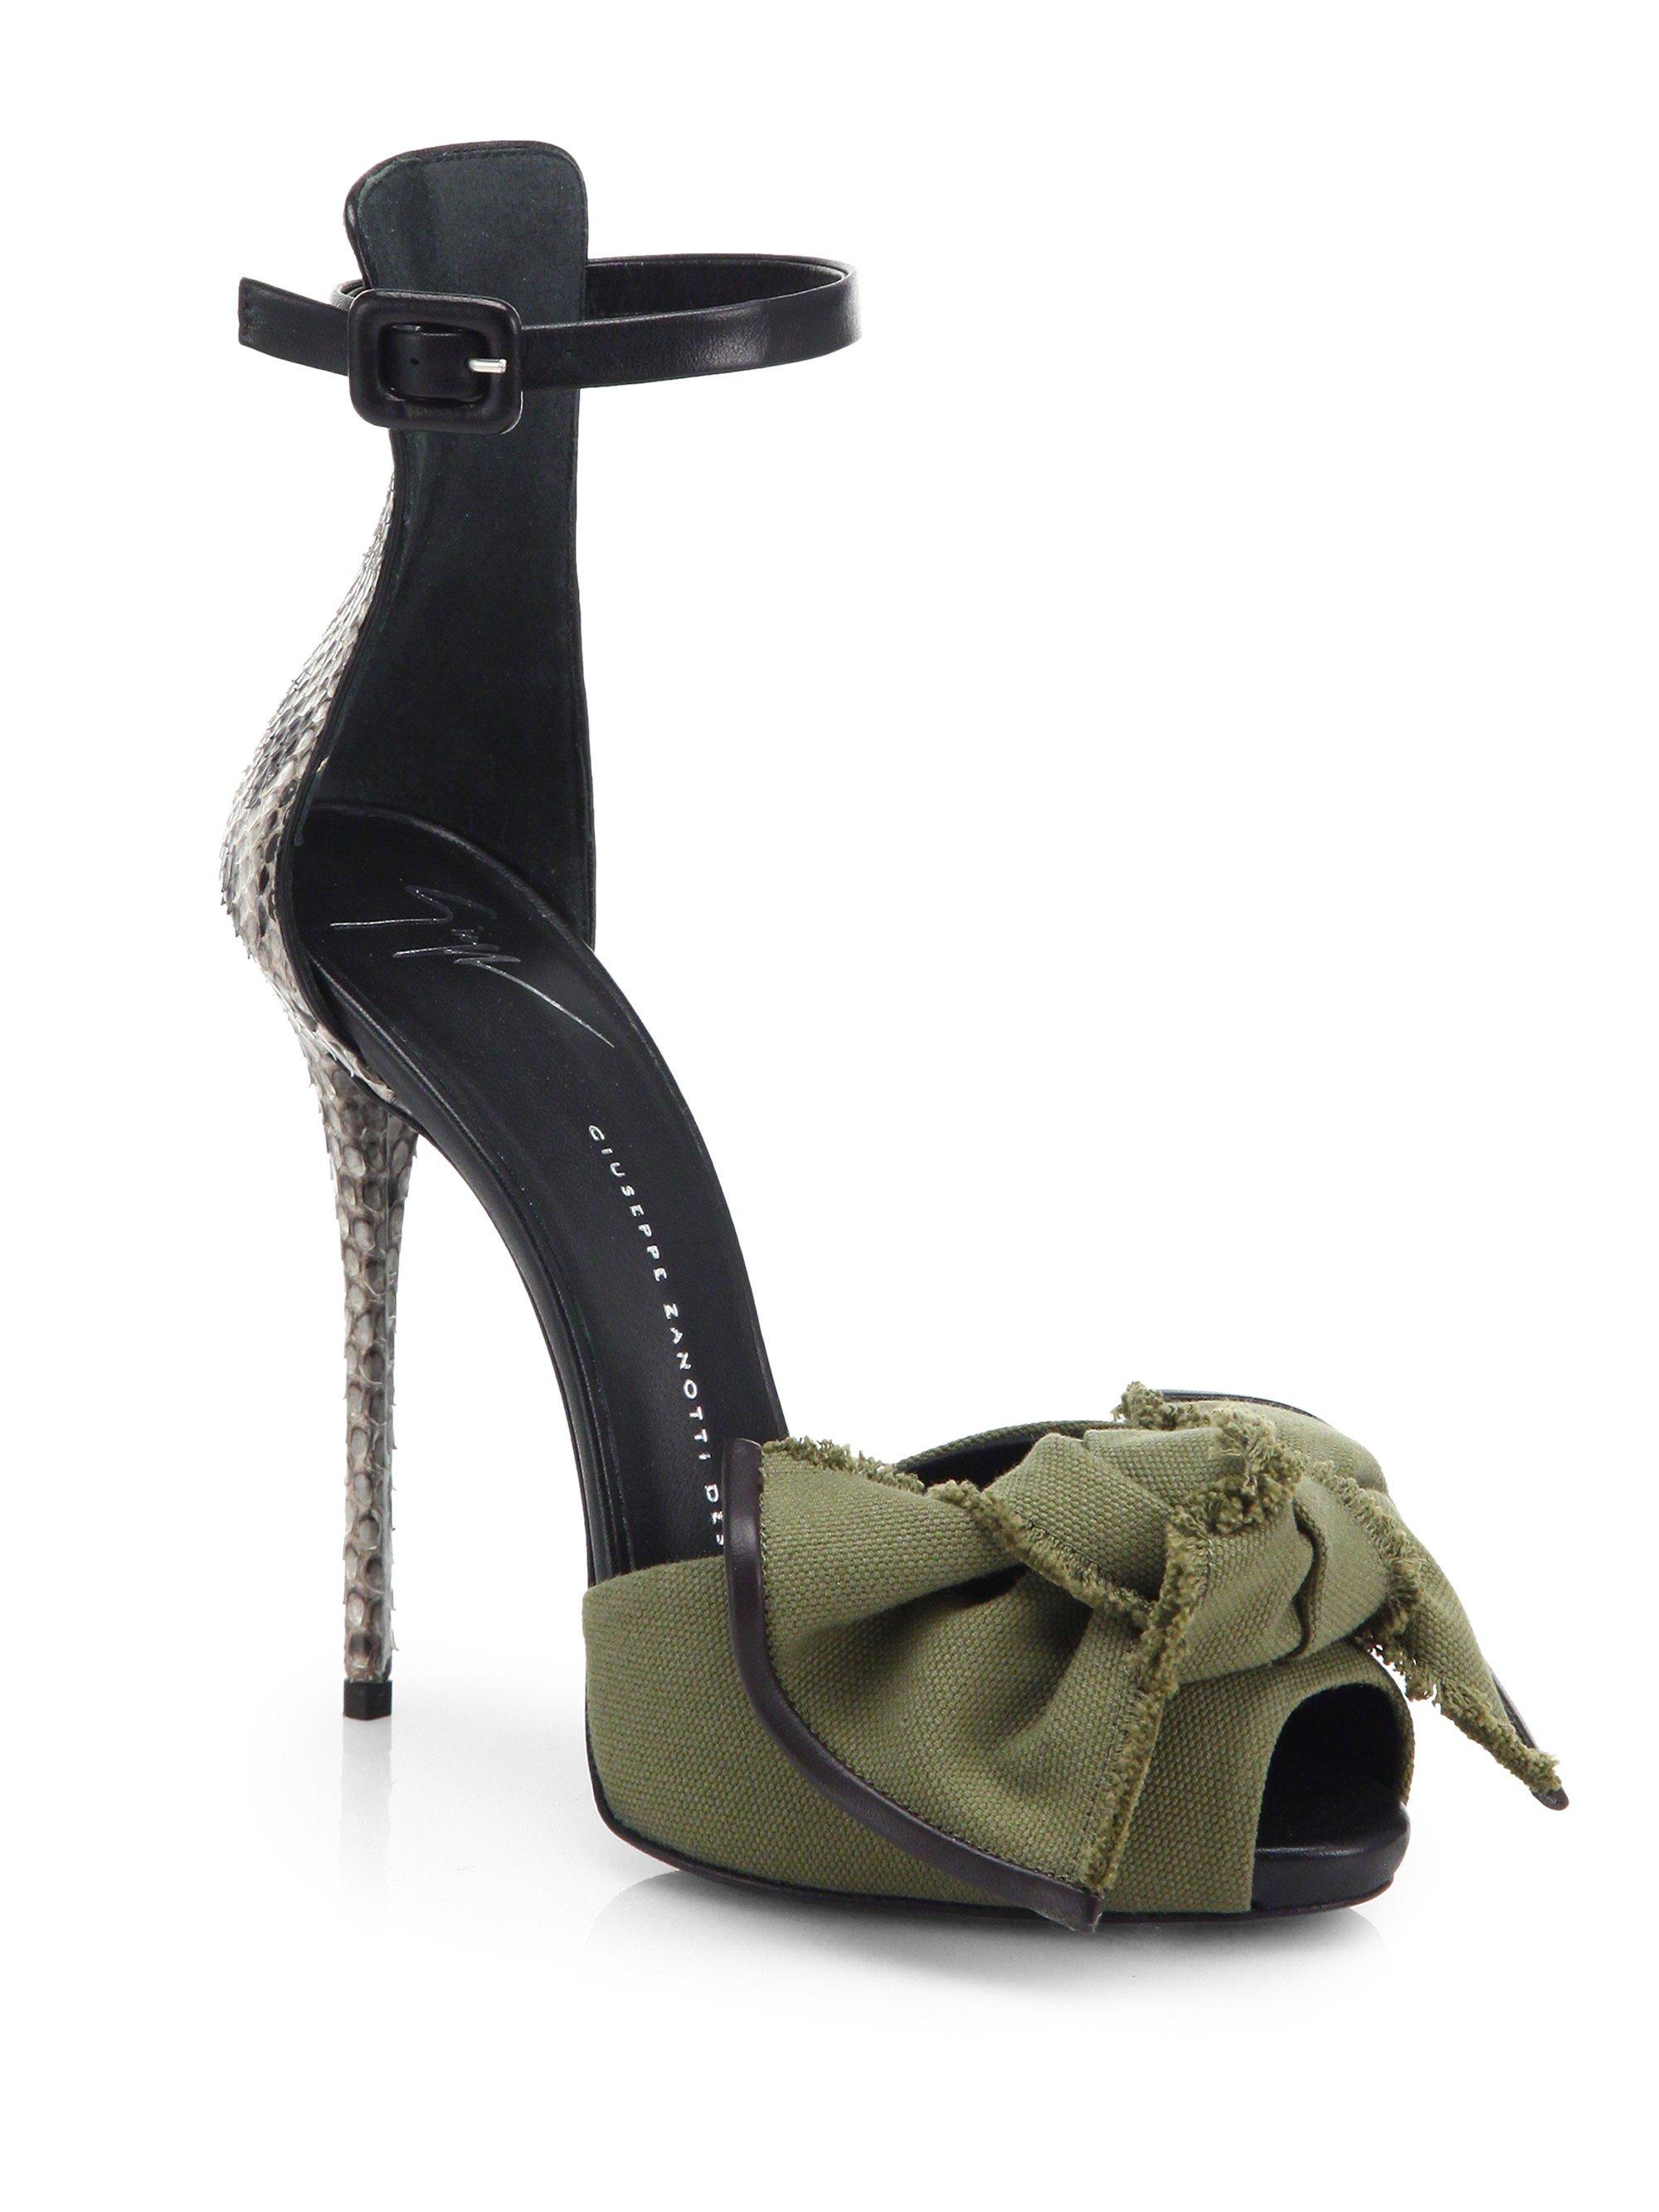 dbbcc0d046a05 ... Lyst - Giuseppe Zanotti Python Canvas Bow Sandals in Green ...